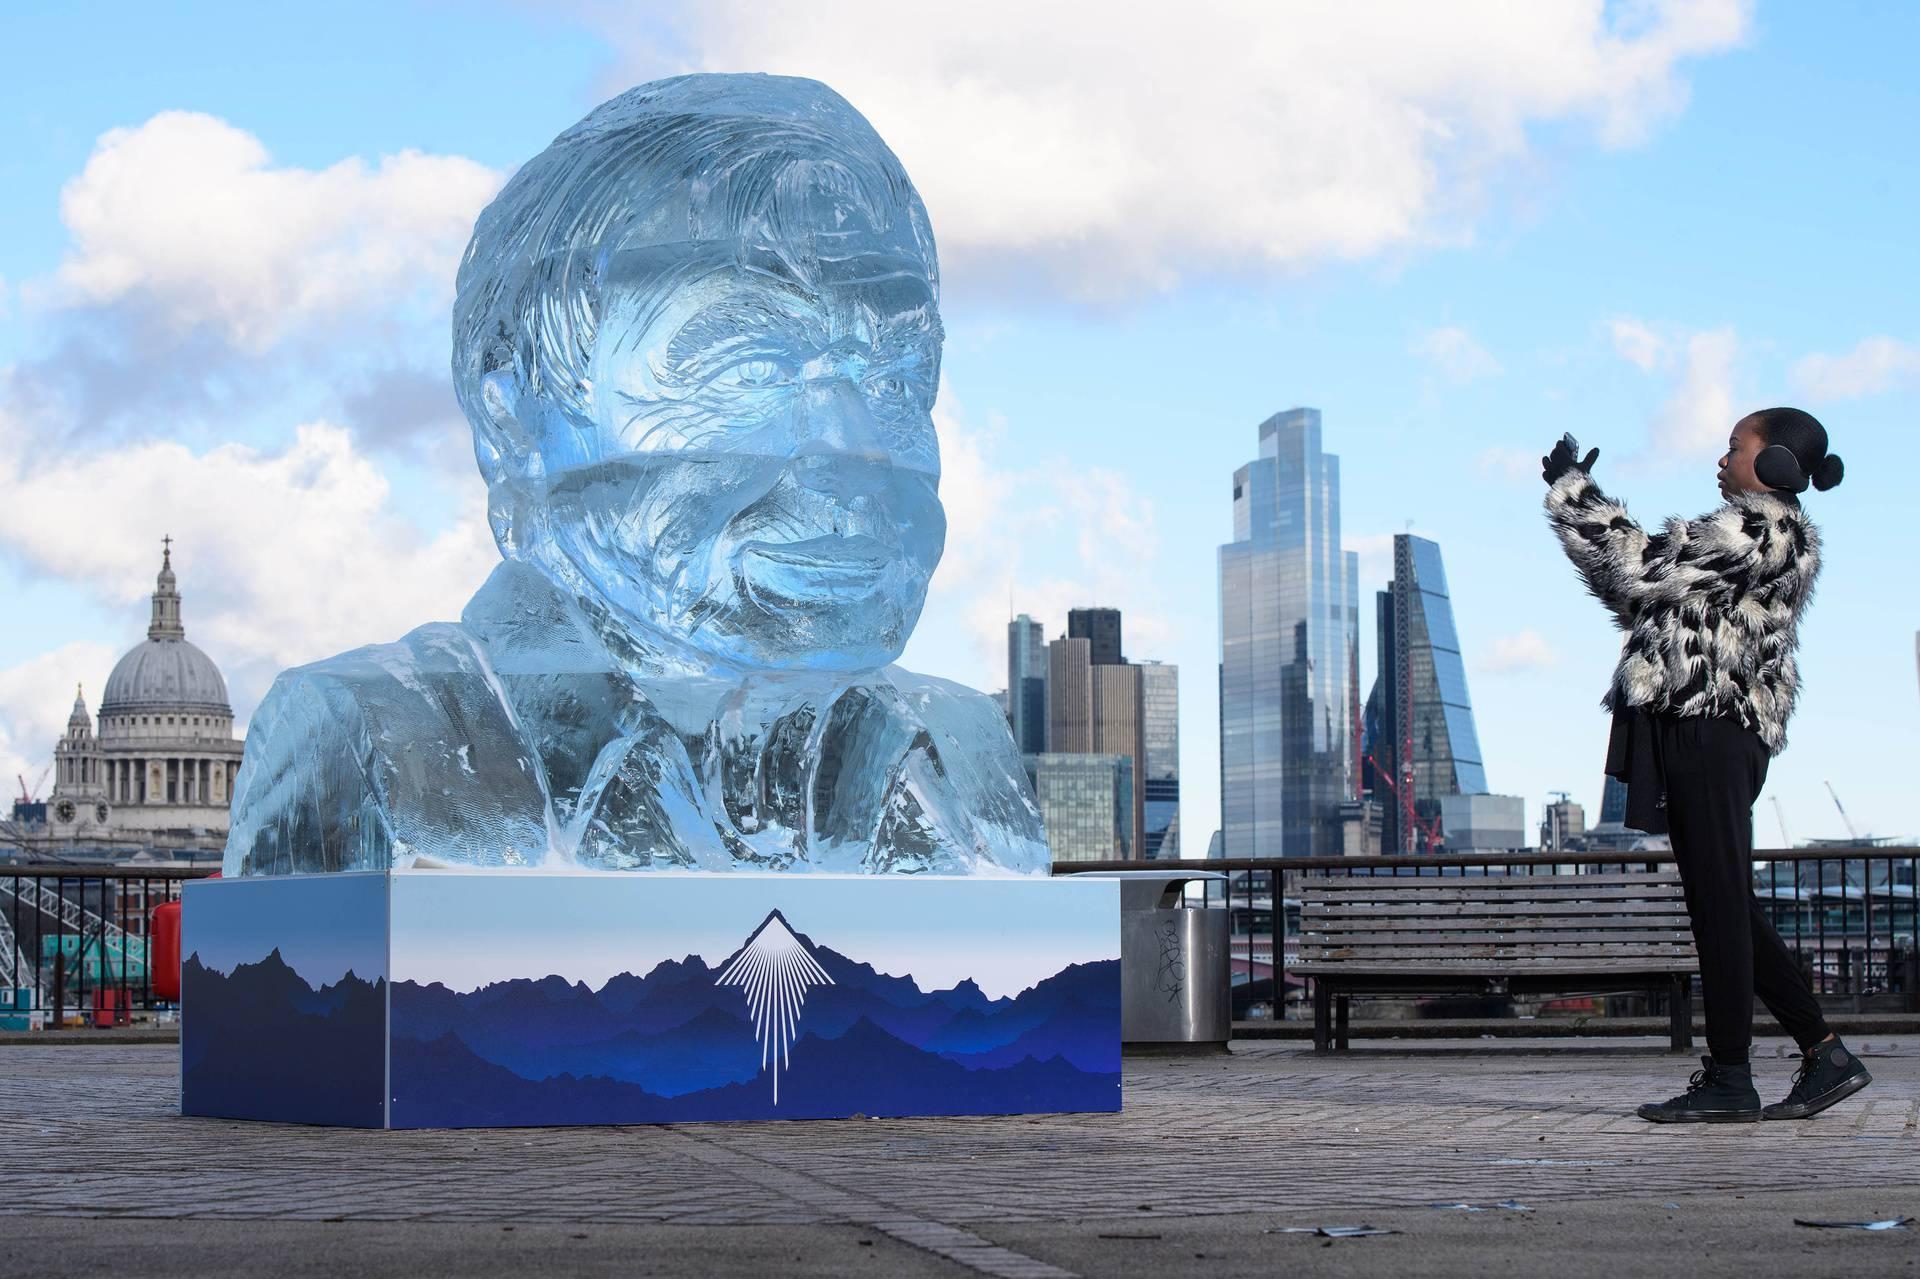 Od dva metra visokog komada leda napravili skulpturu Sir Davida Attenborougha